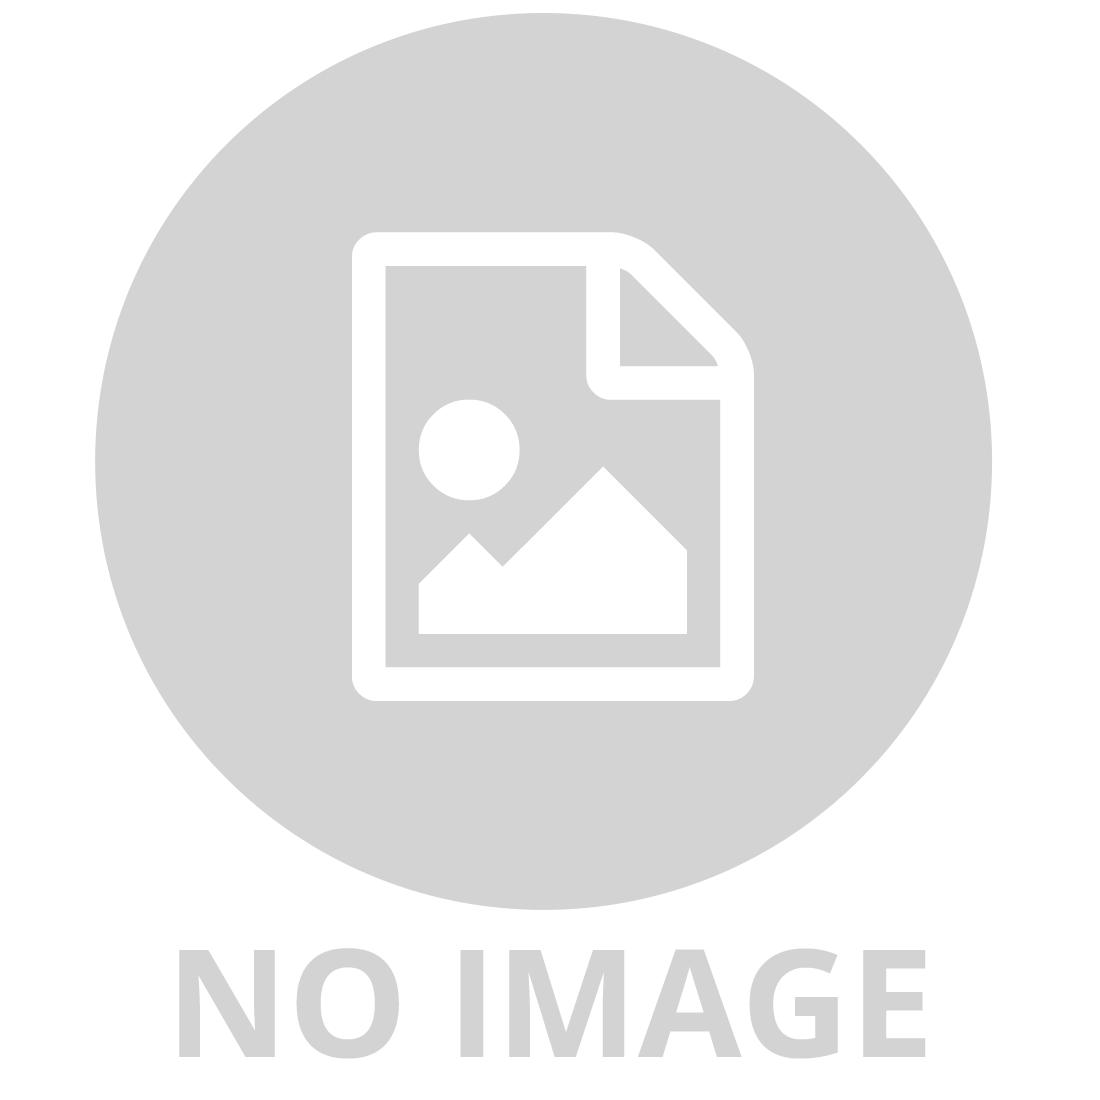 RAVENSBURGER 2 X 12 PIECE HAPPY ANIMAL FAMILIES JIGSAW PUZZLE